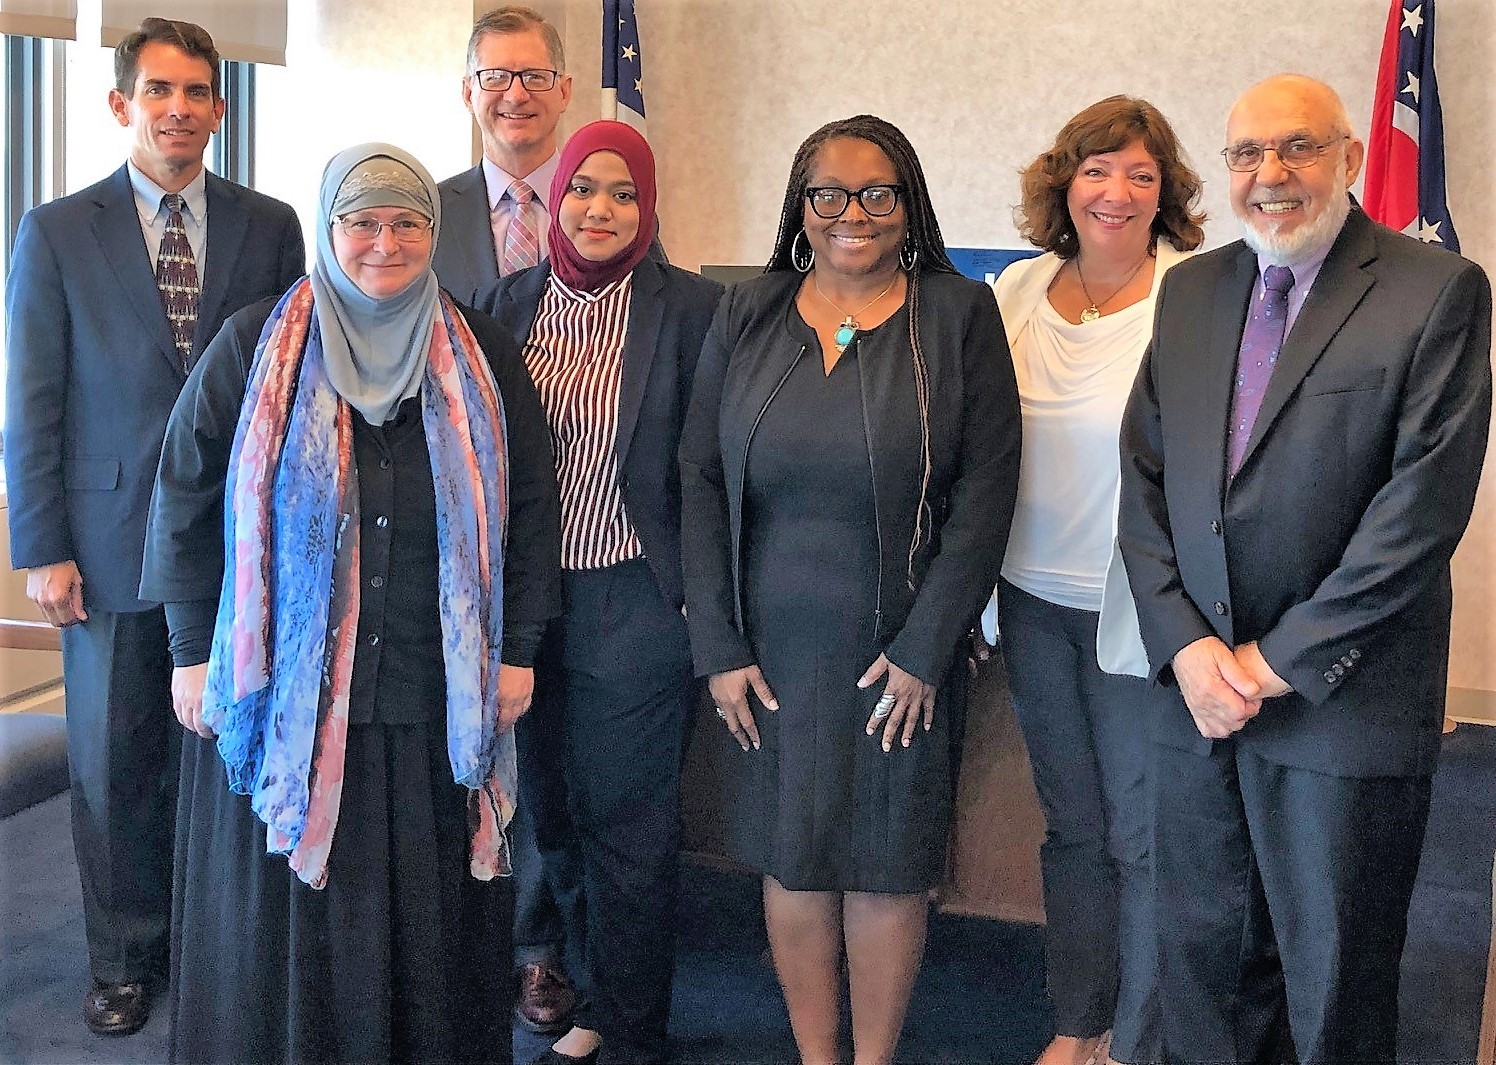 UCC and CAIR officials visit Sen. Portman's CLE office, 8/29/19